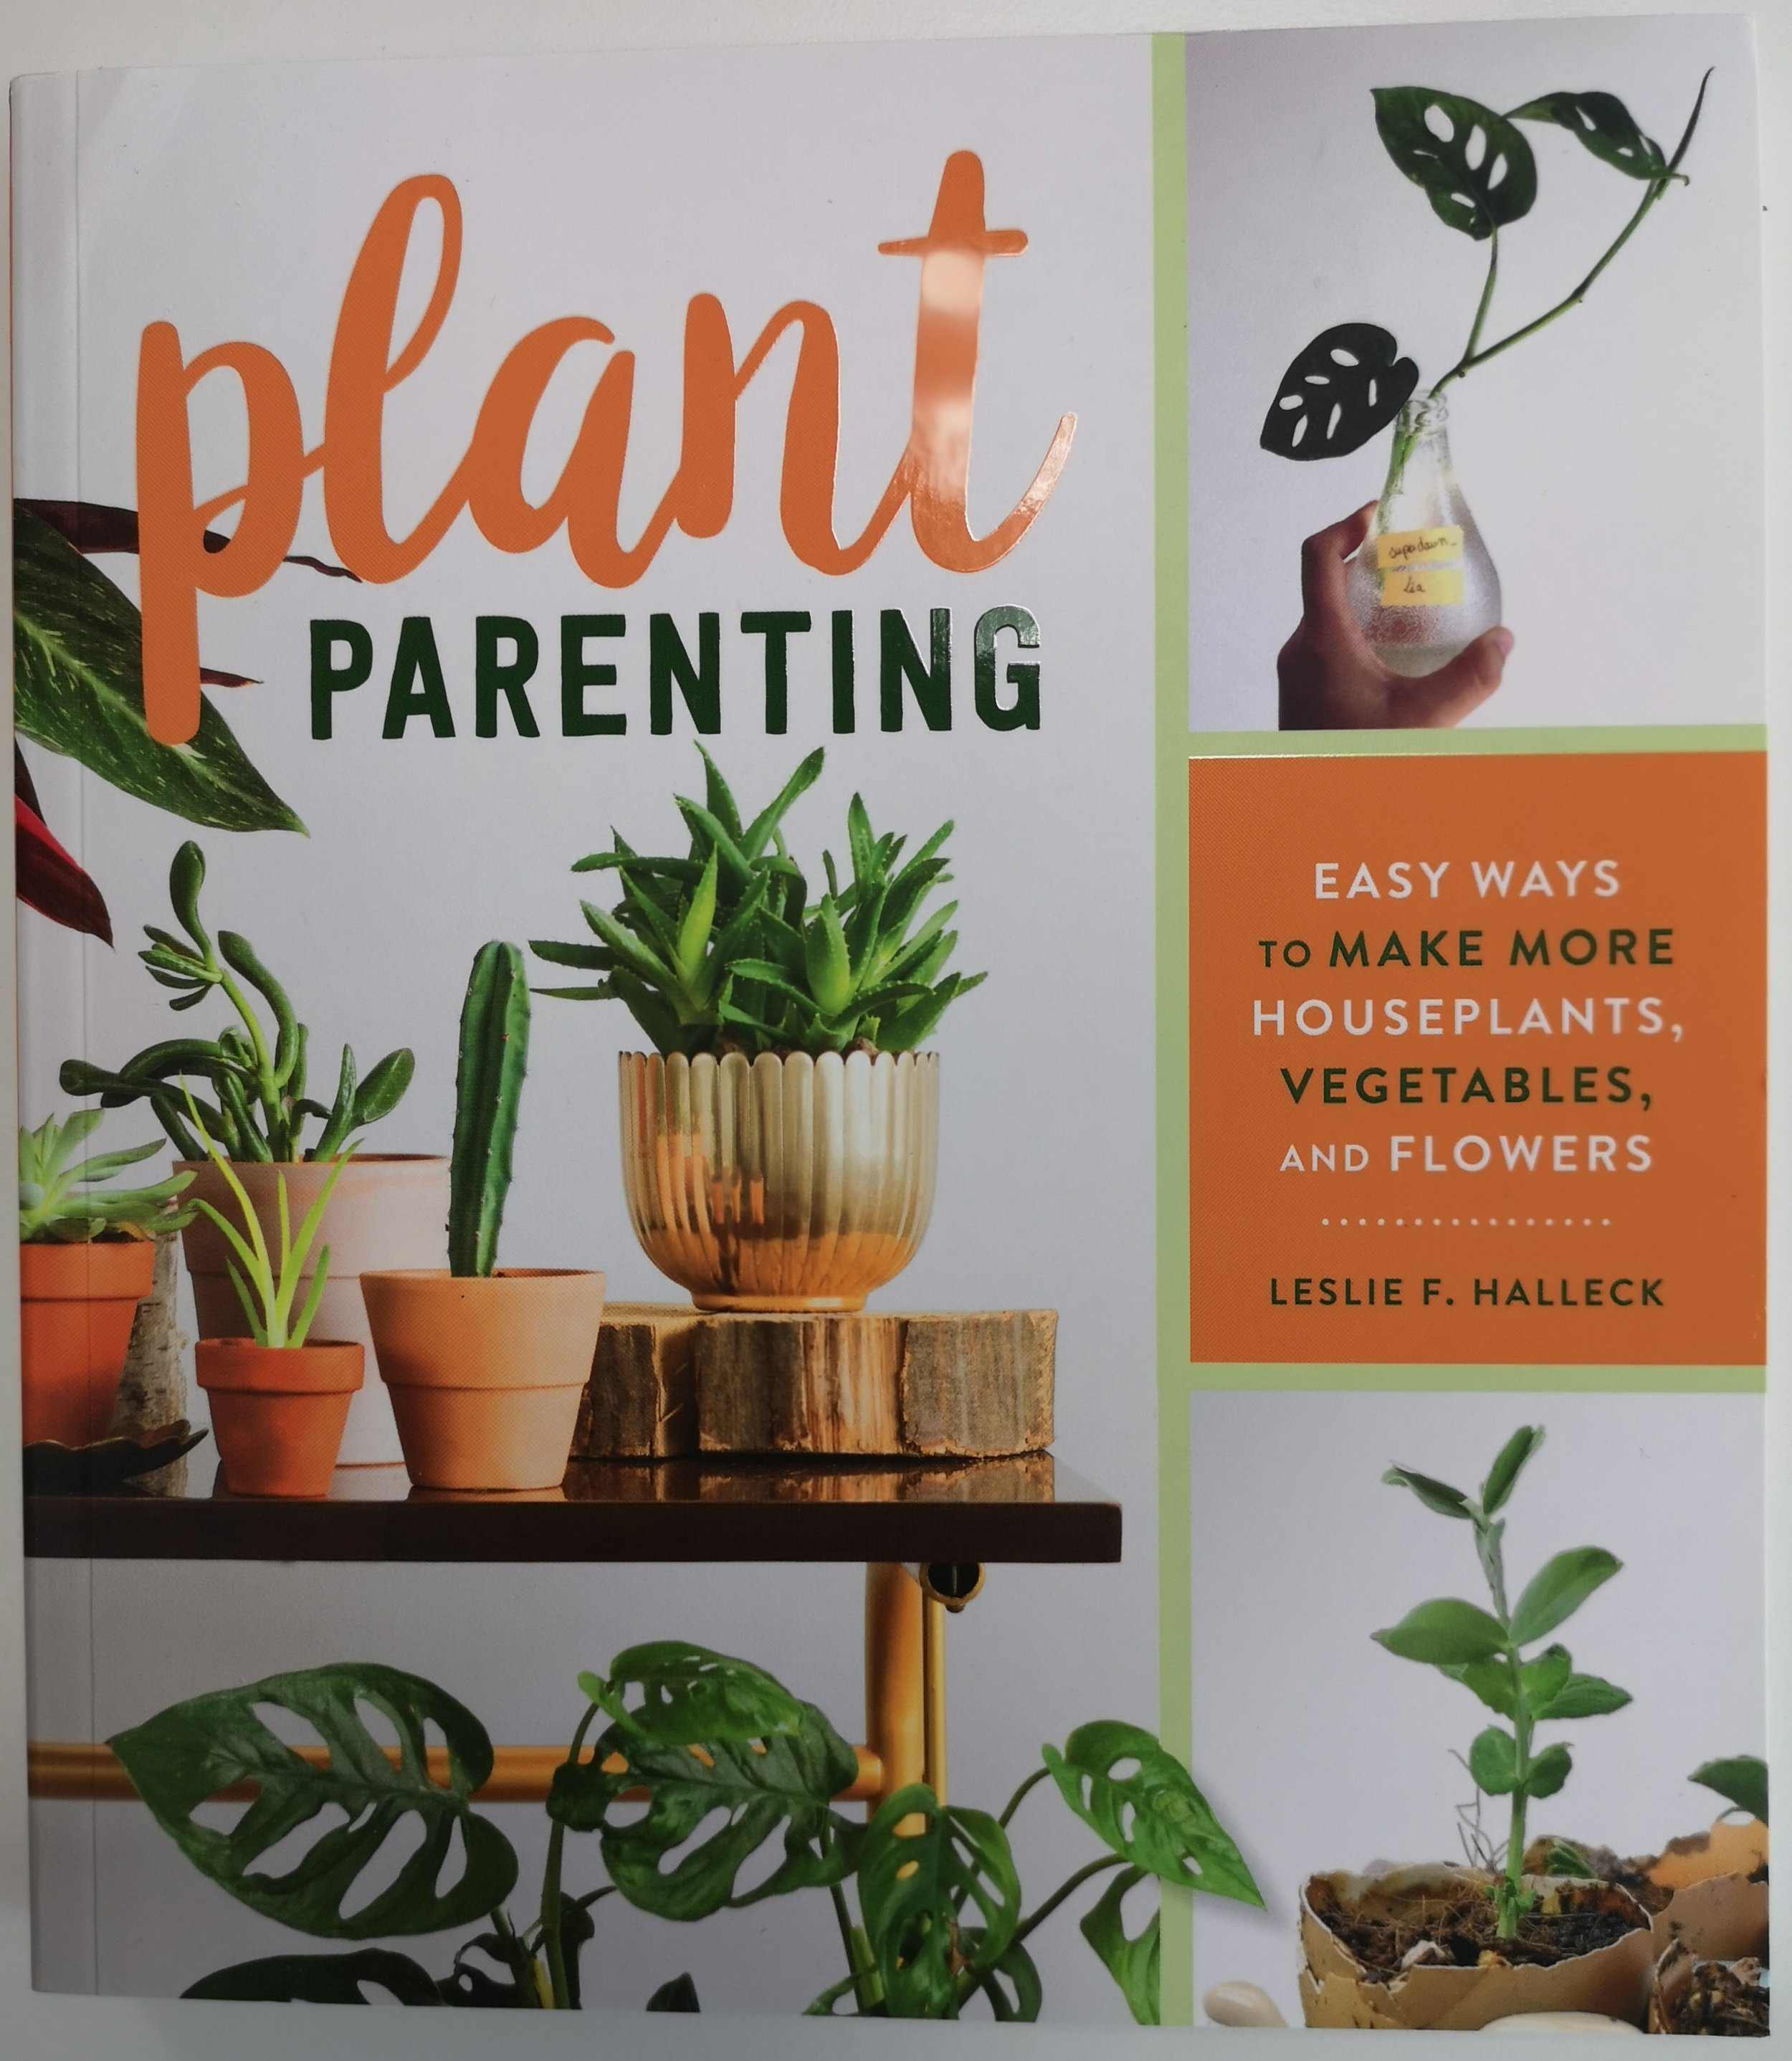 Leslie F. Halleck: Plant Parenting